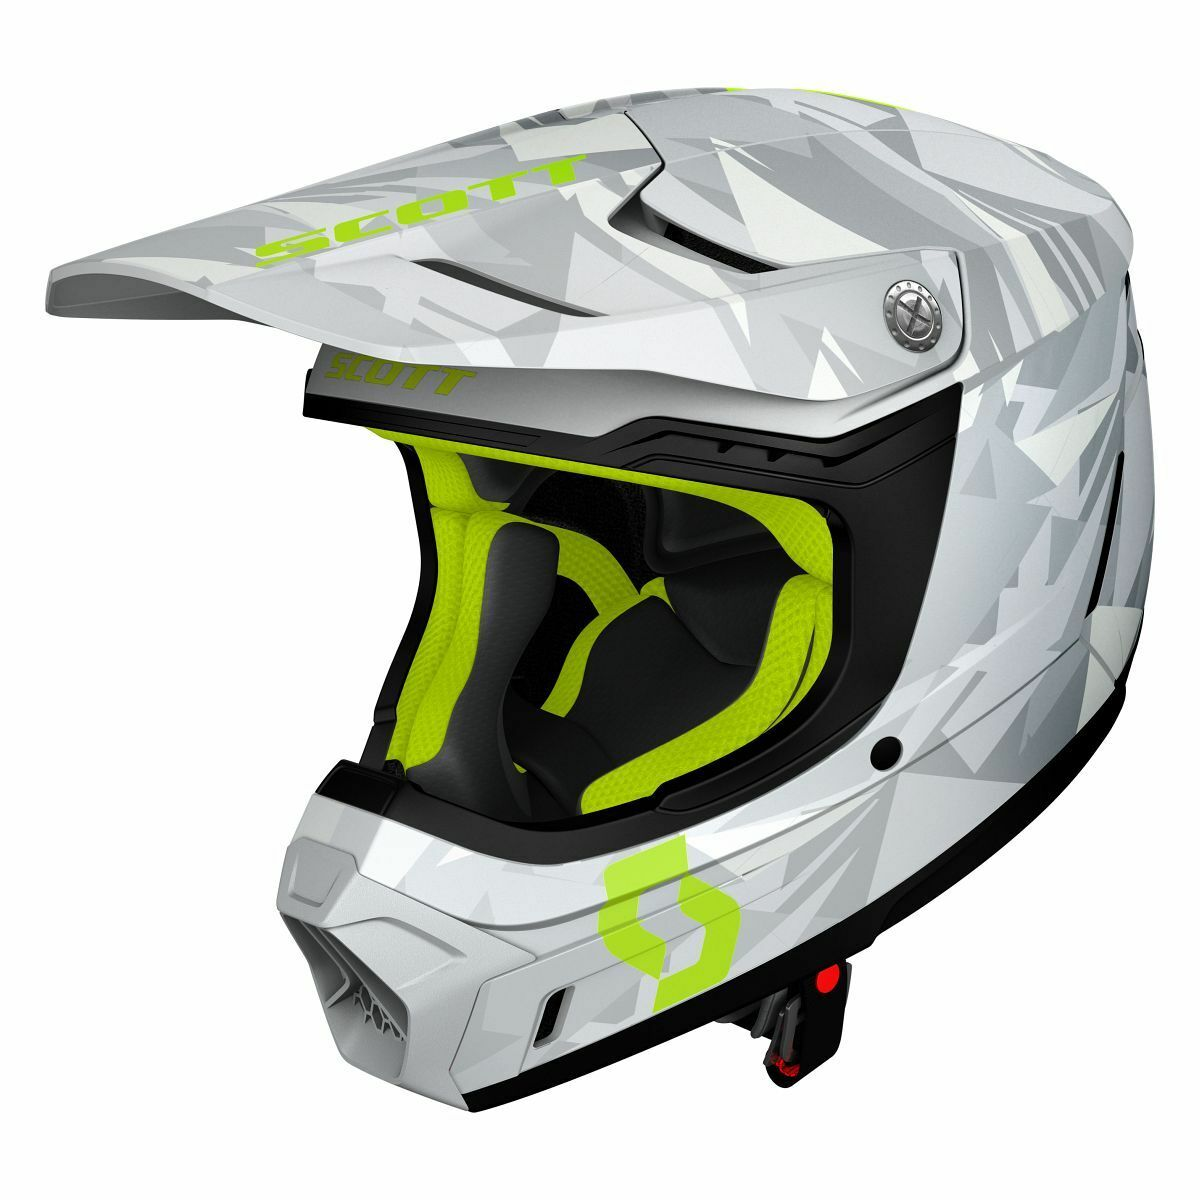 Motos de Scott 350 Evo Camo MX Enduro   casco gris amarillo 2019 de la bici